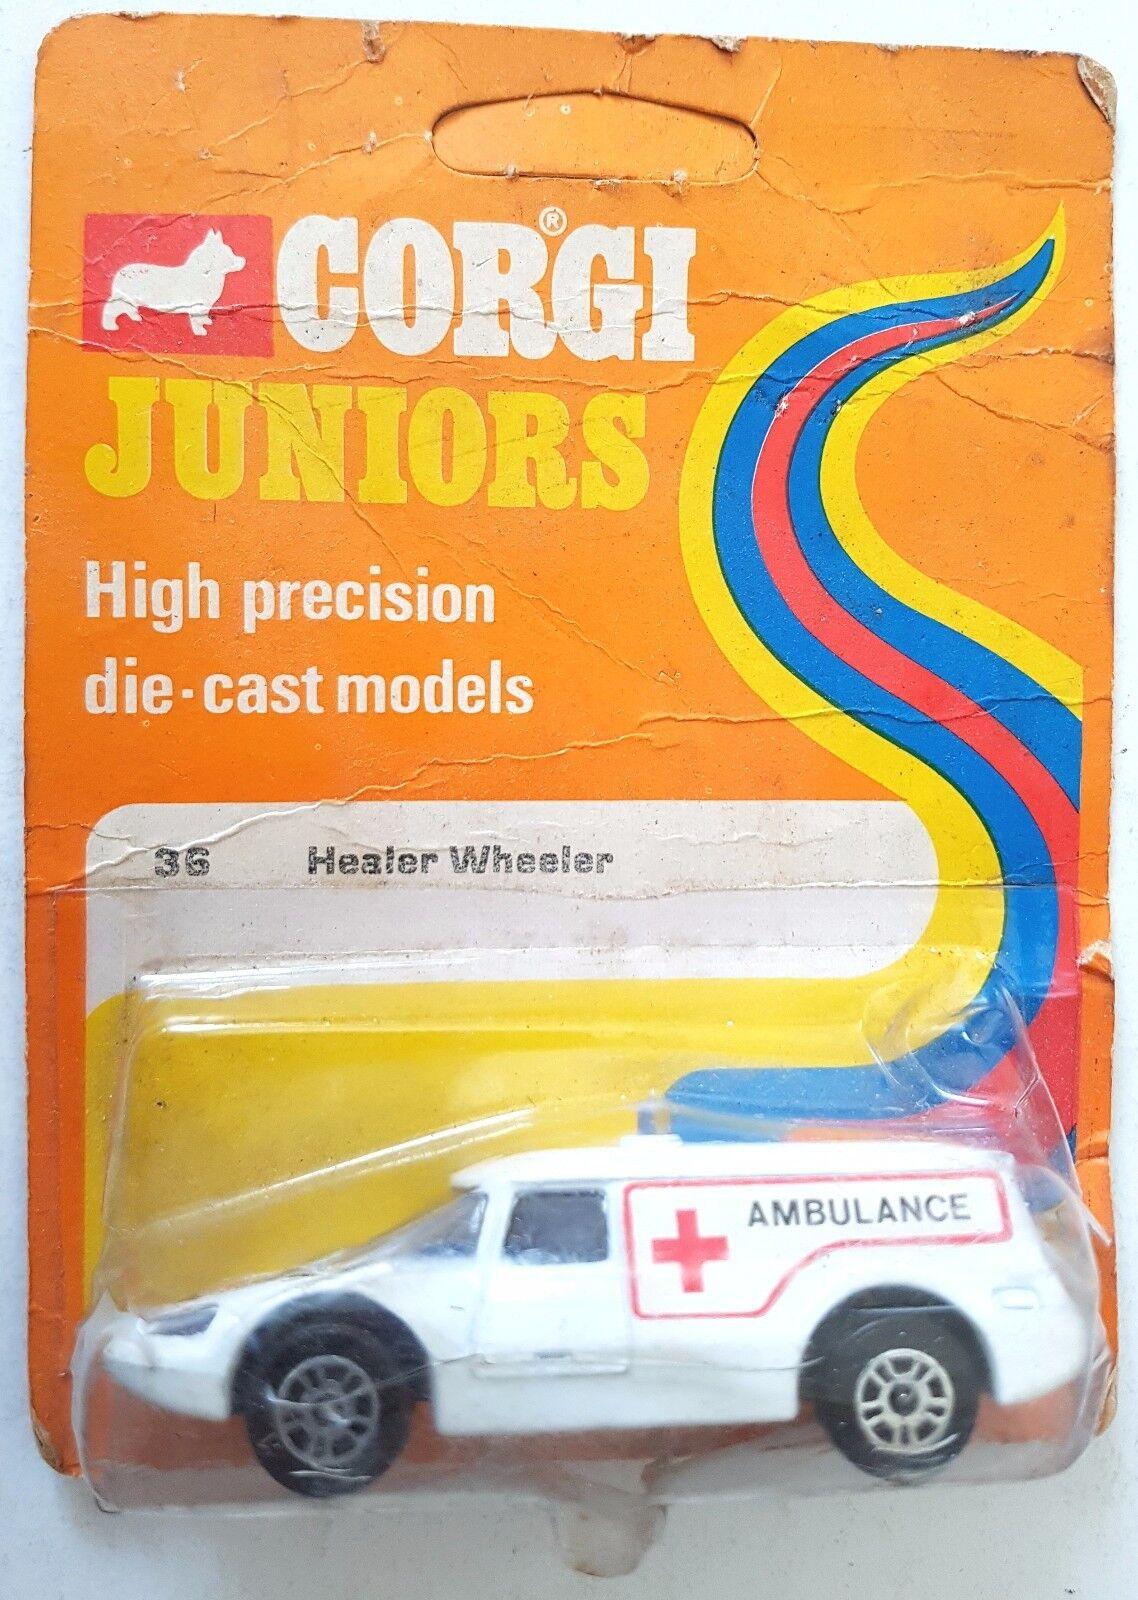 '73 CORGI Juniors 36 HEALER WHEELER AMBULANCE Diecast Model Car Car Car on Original Card 52d78c